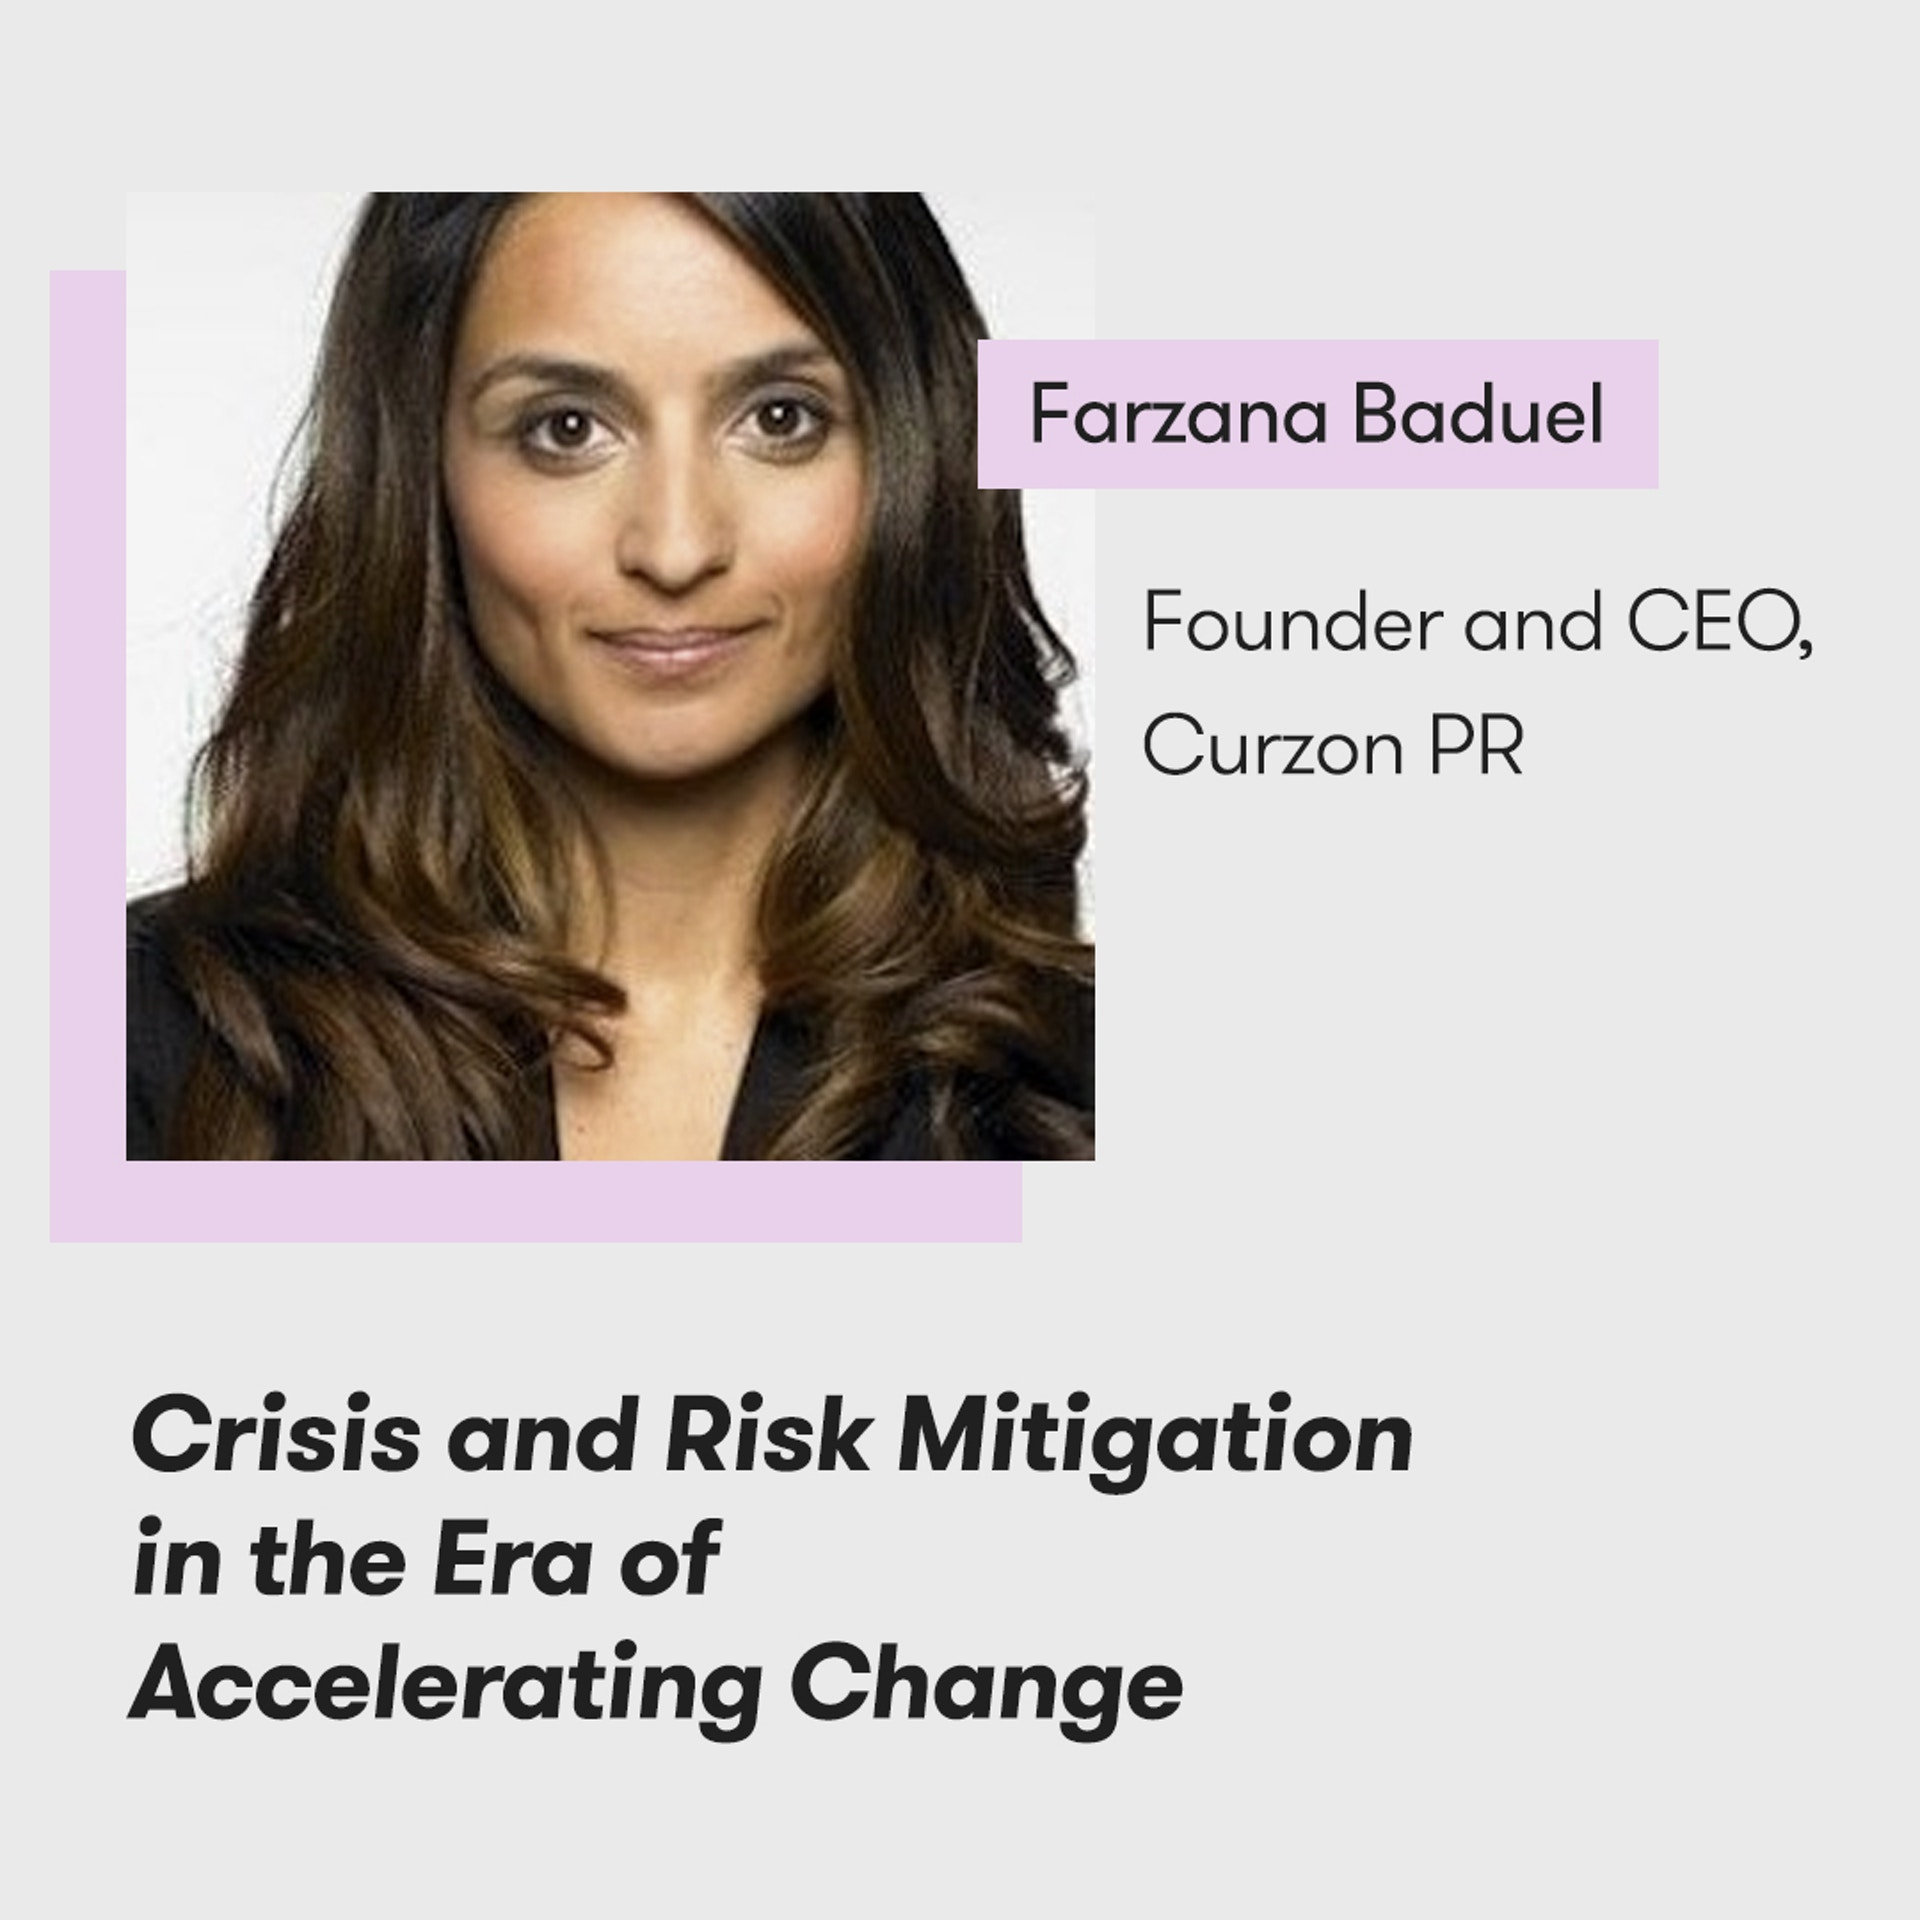 Meltwater Digital Summit - The Future of PR, Marketing and Tech - Farzana Baduel